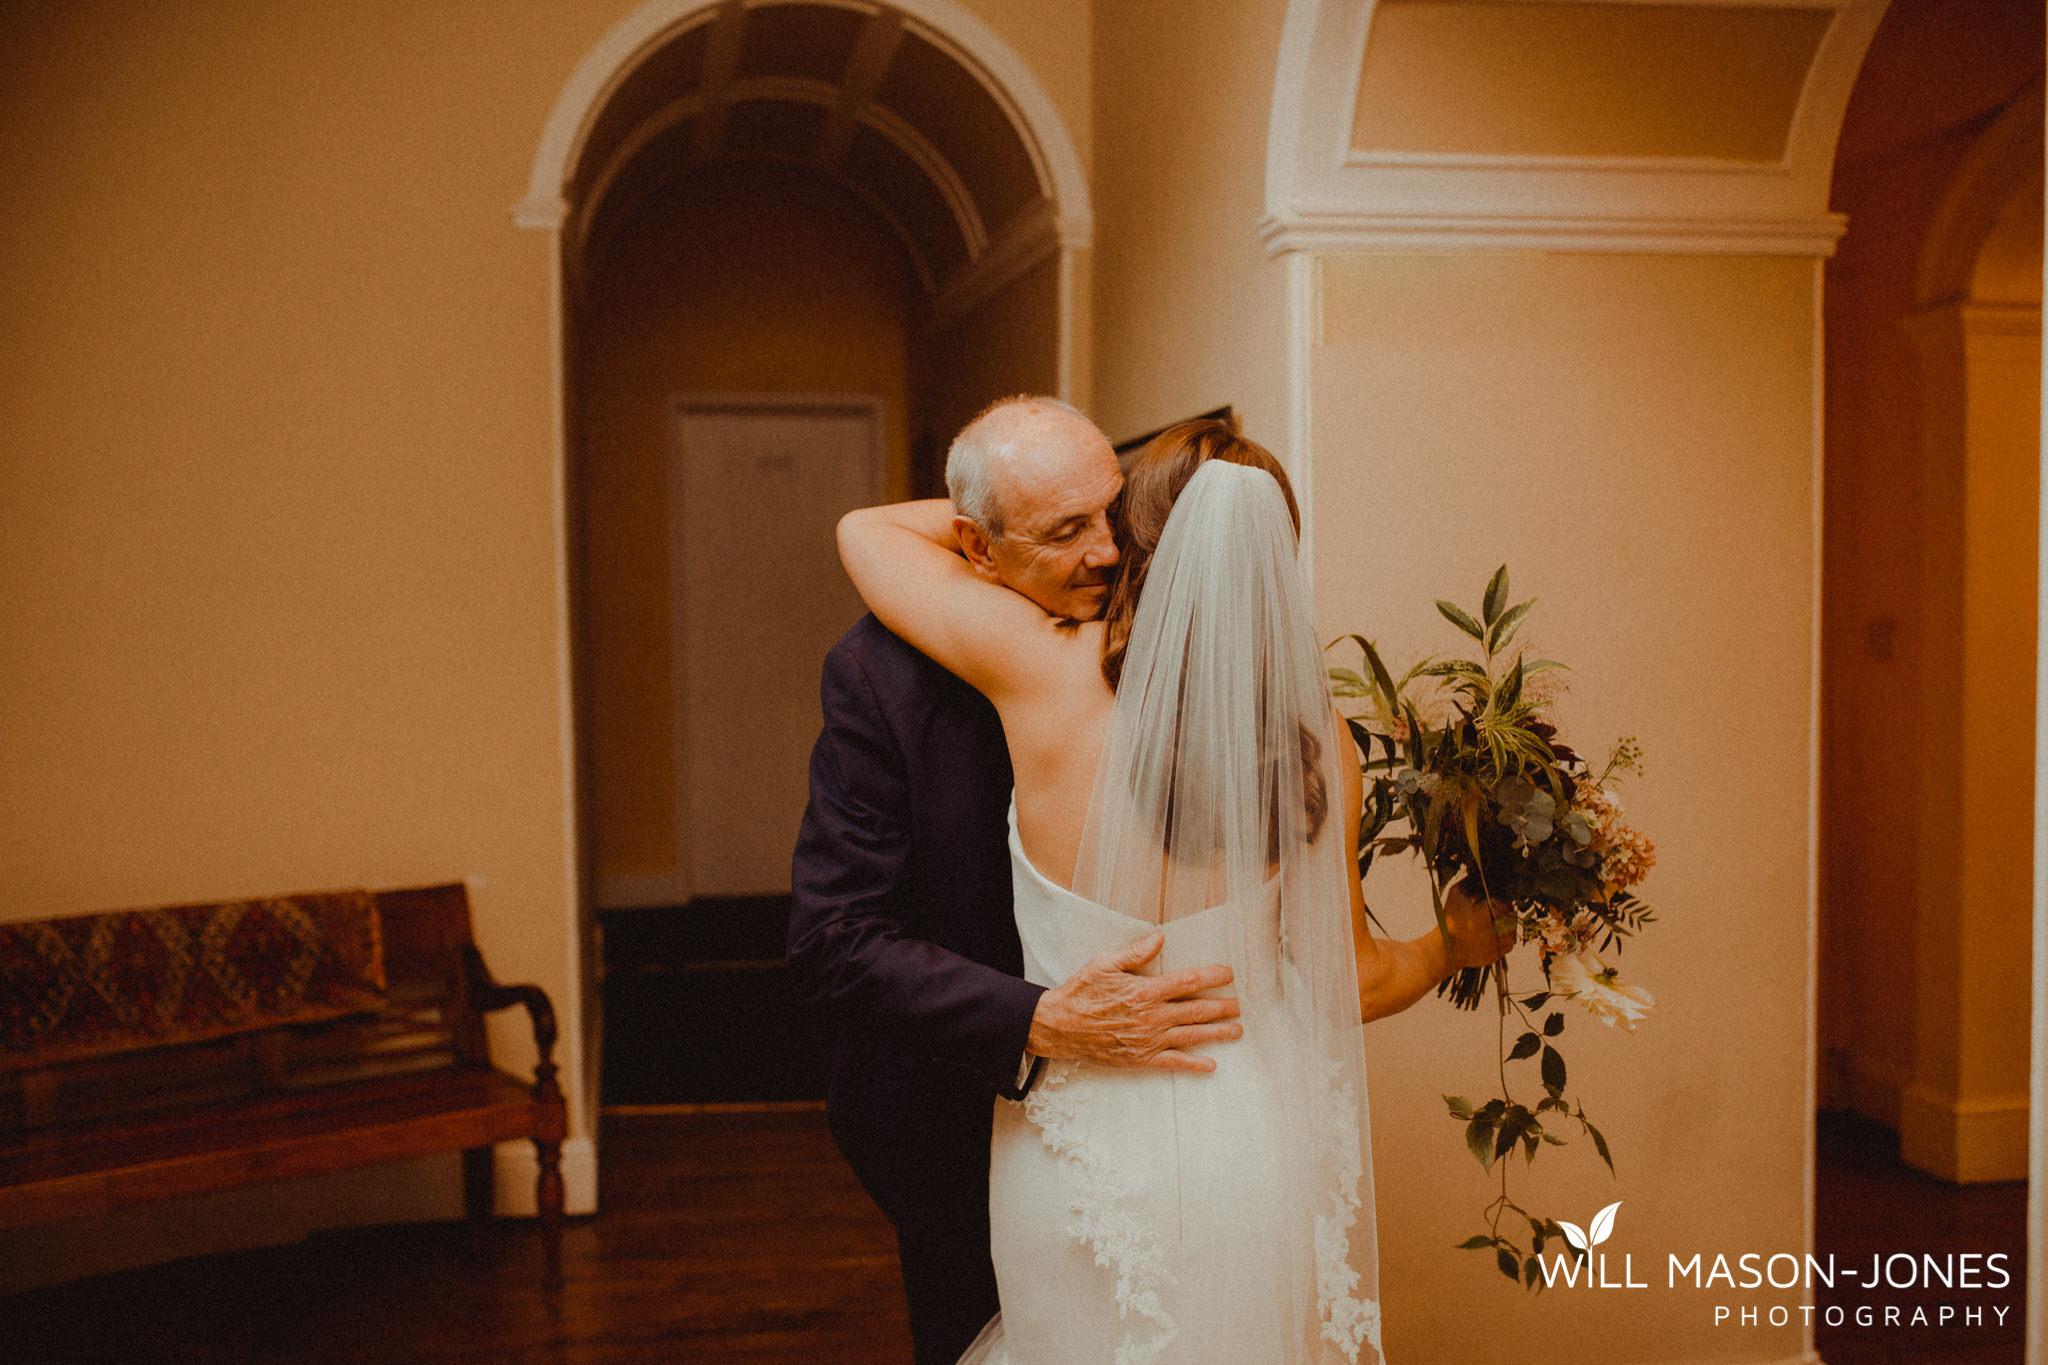 plas-glansevin-wet-rainy-bridal-wedding-preparations-swansea-photographers-18.jpg